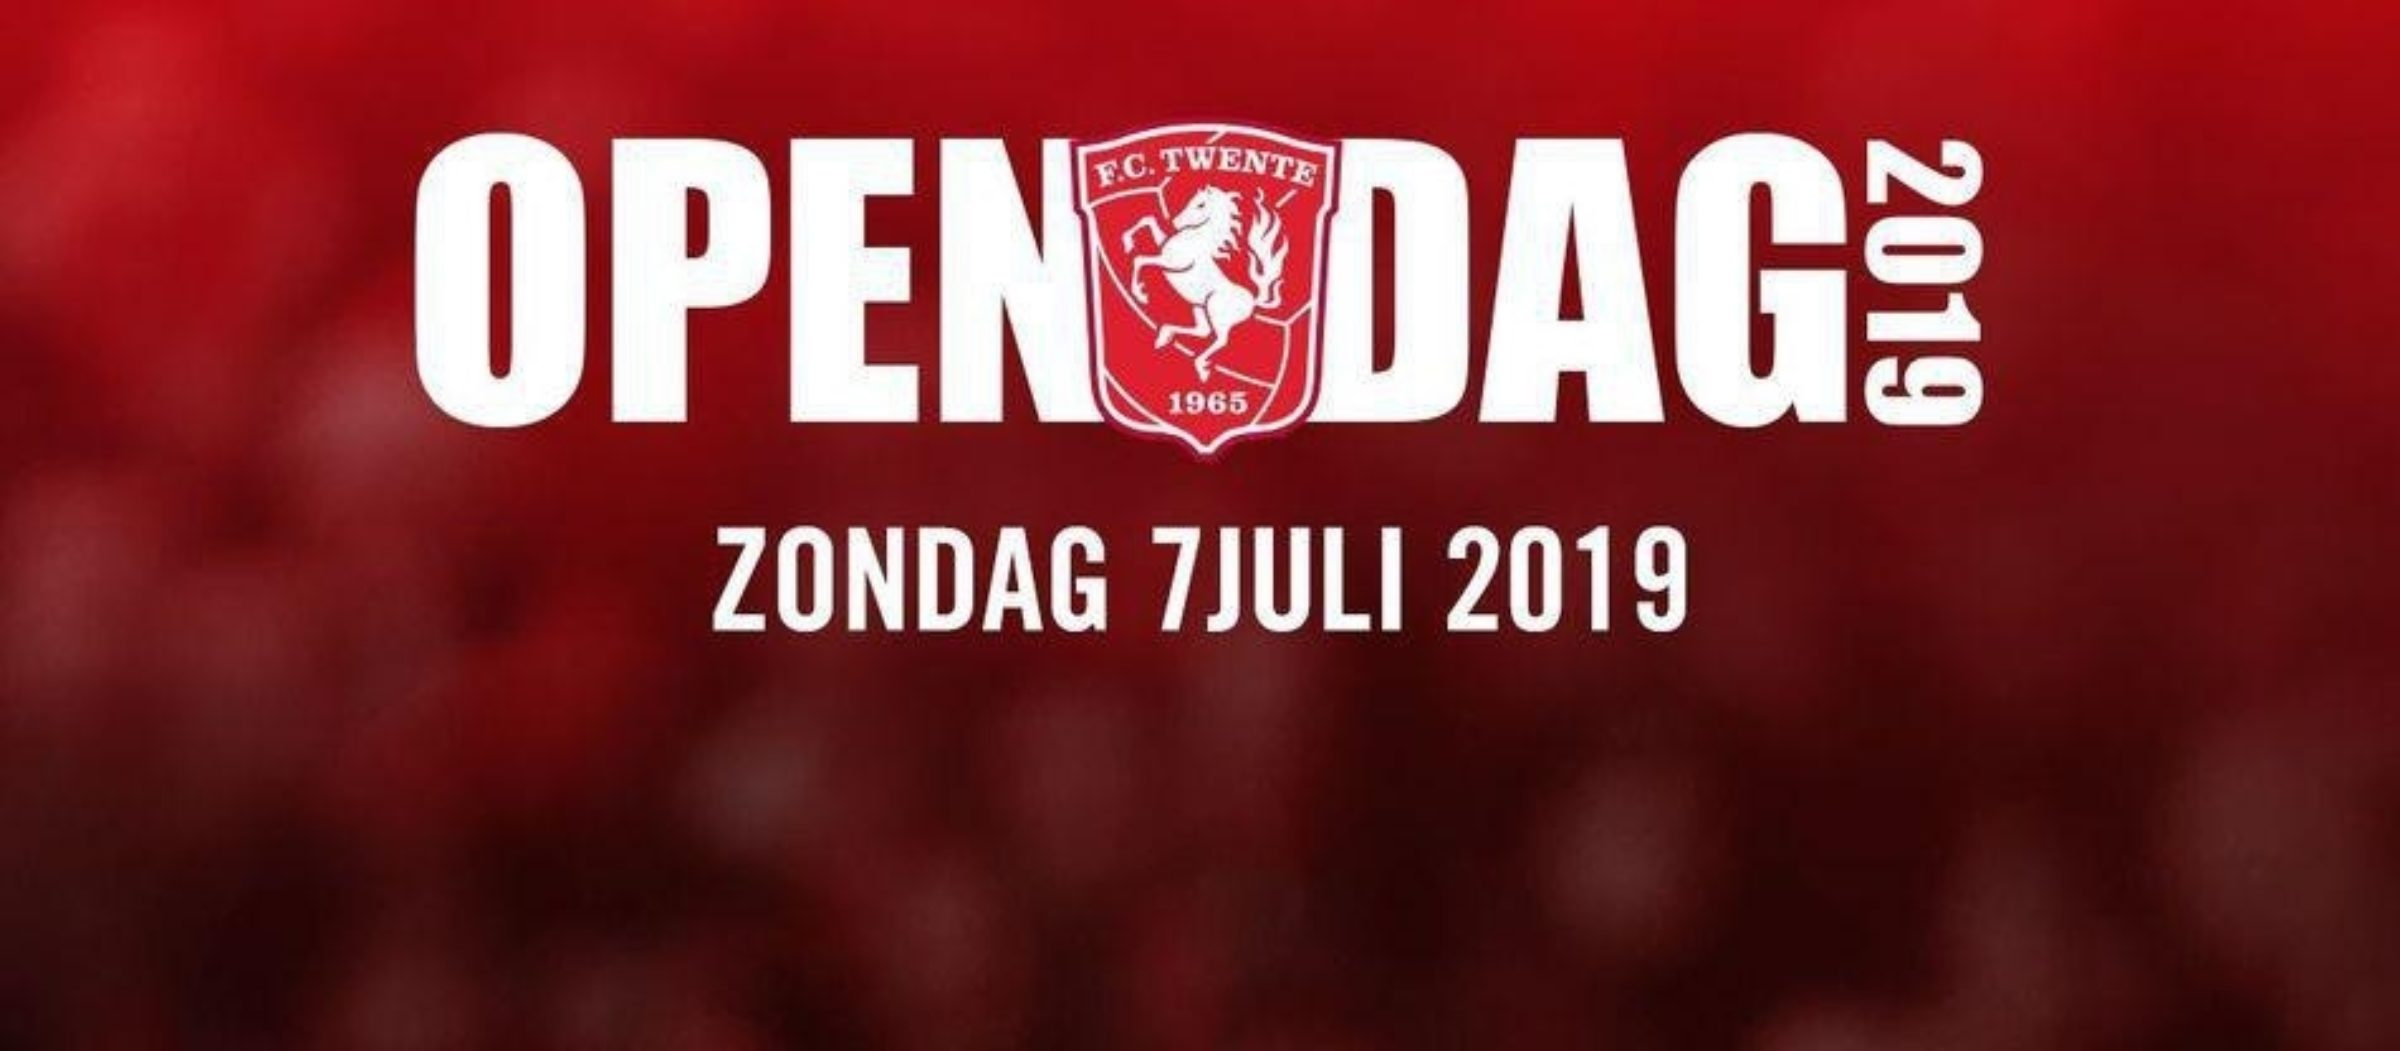 Open dag FC Twente 2437 1552405550 35hxecskw8